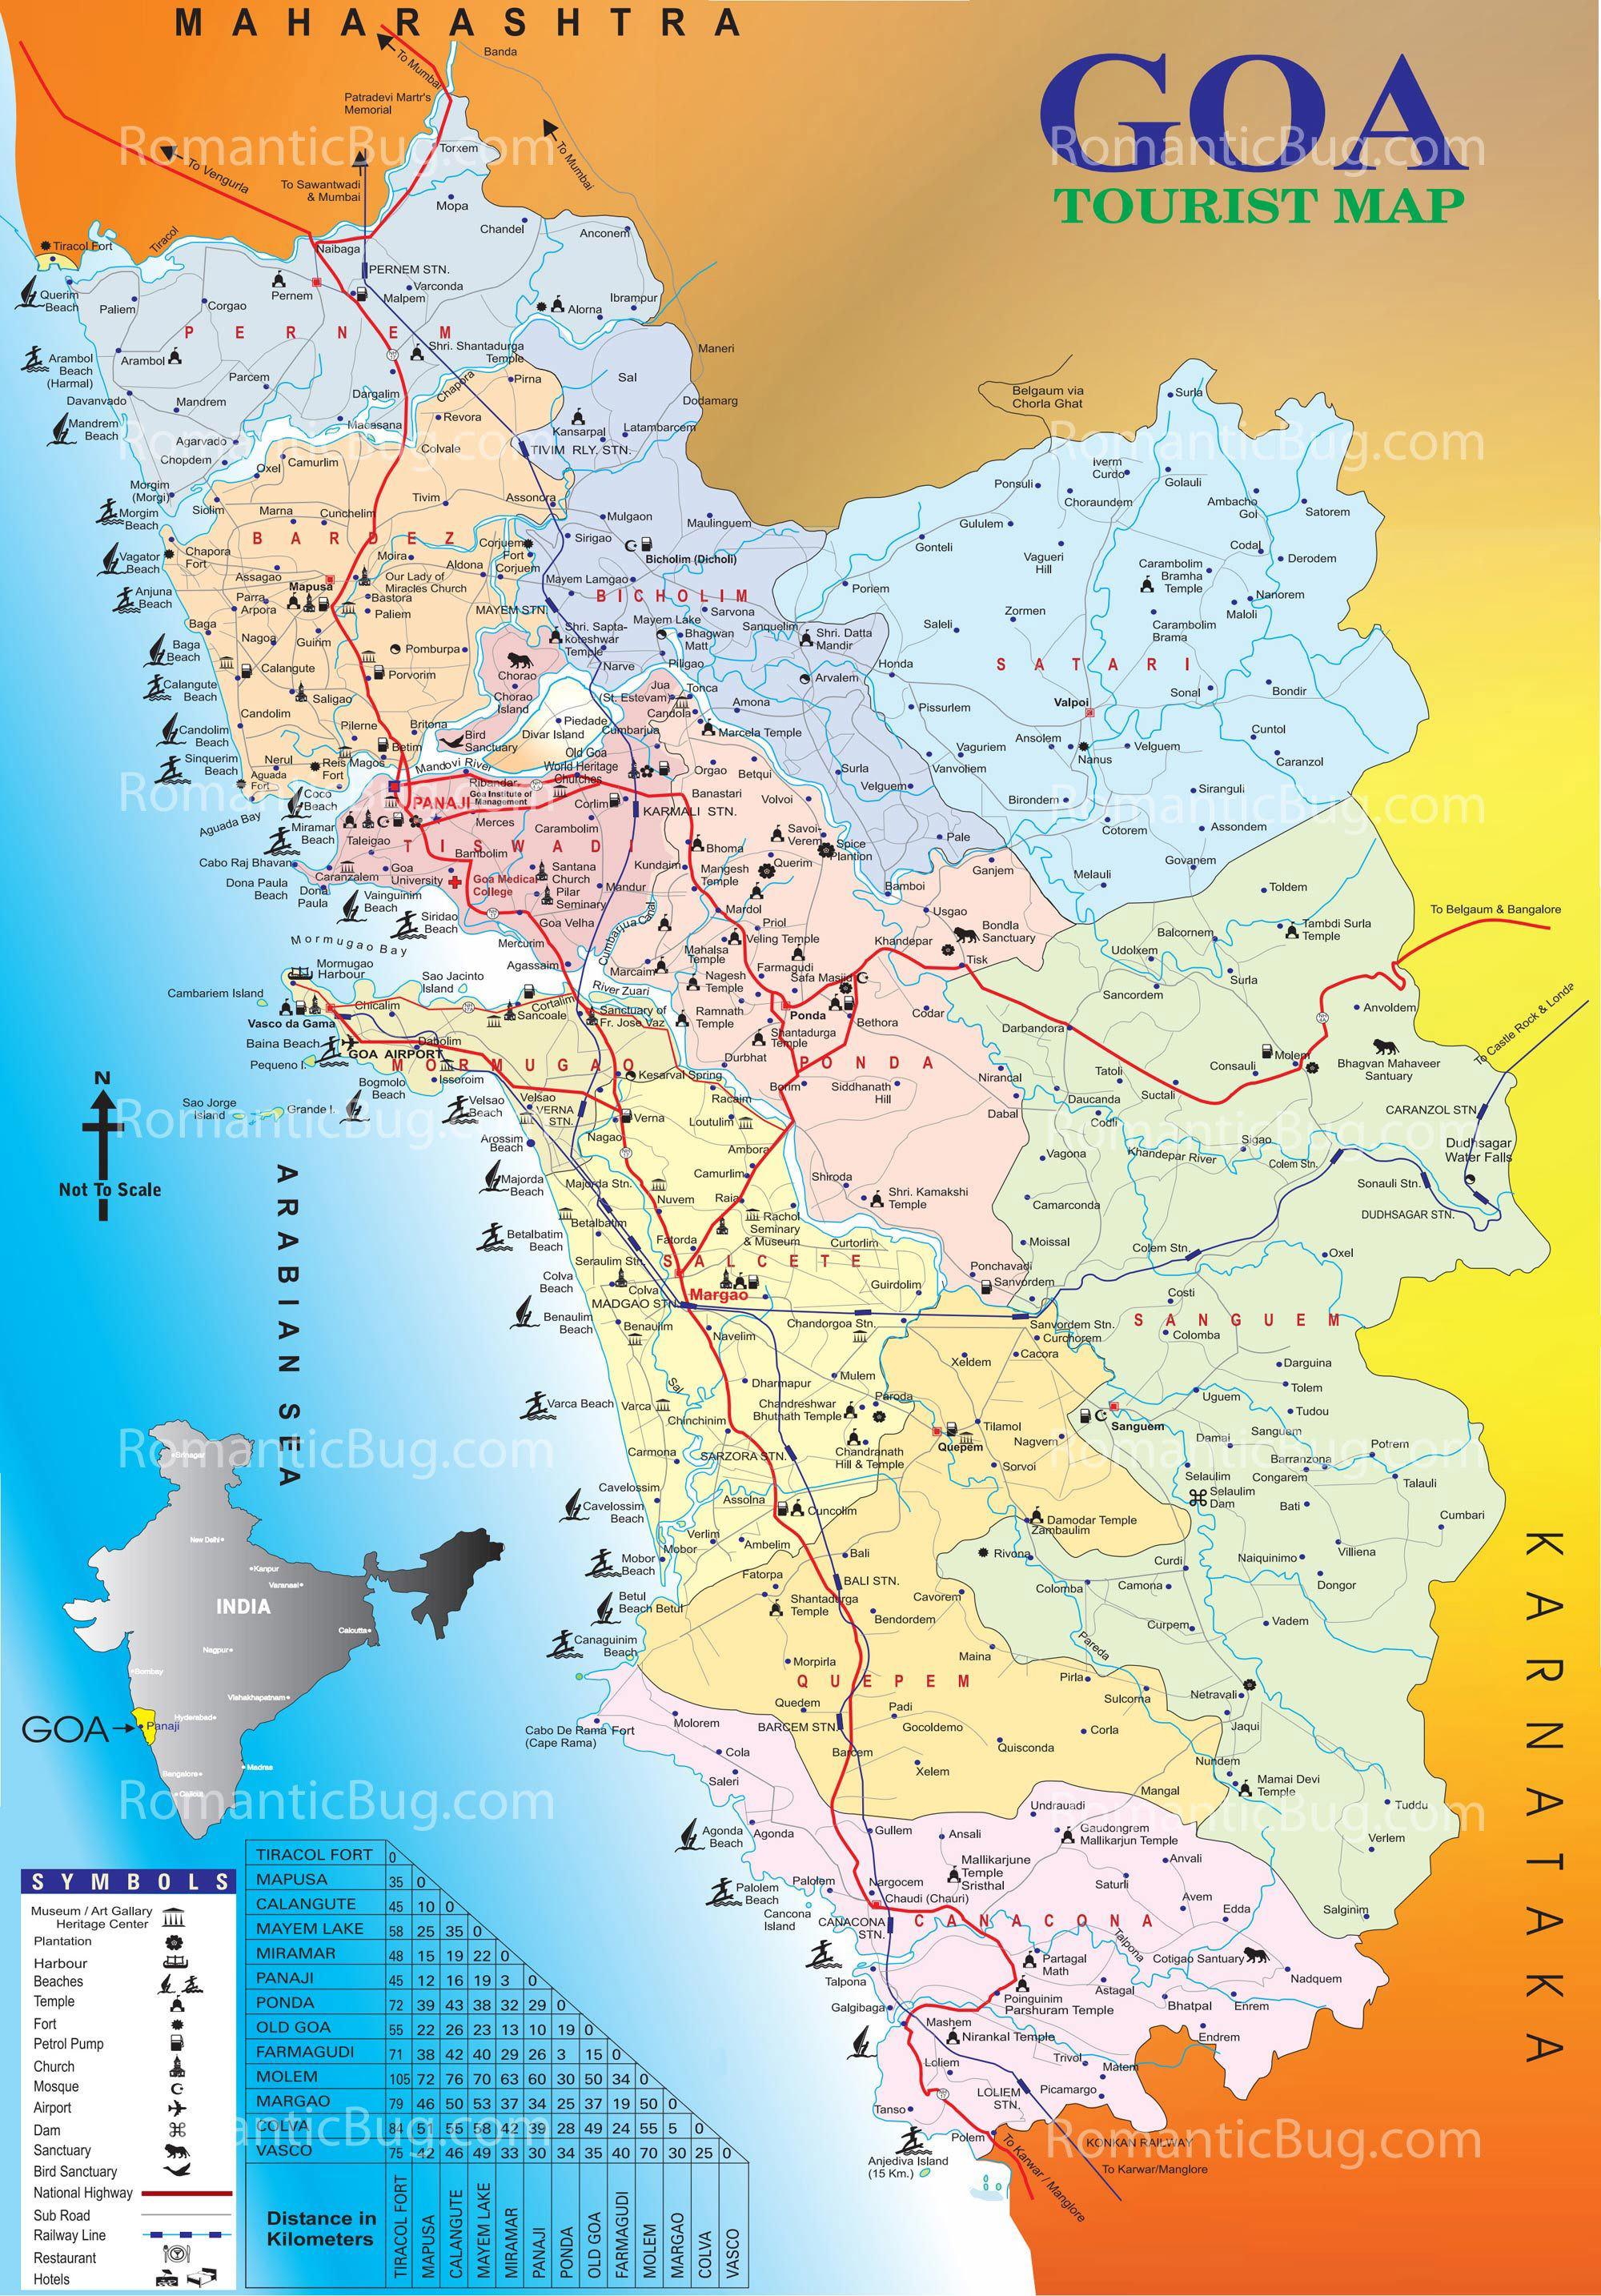 Download Free Tourist Map Of Goa Complete Goa Tourism Map